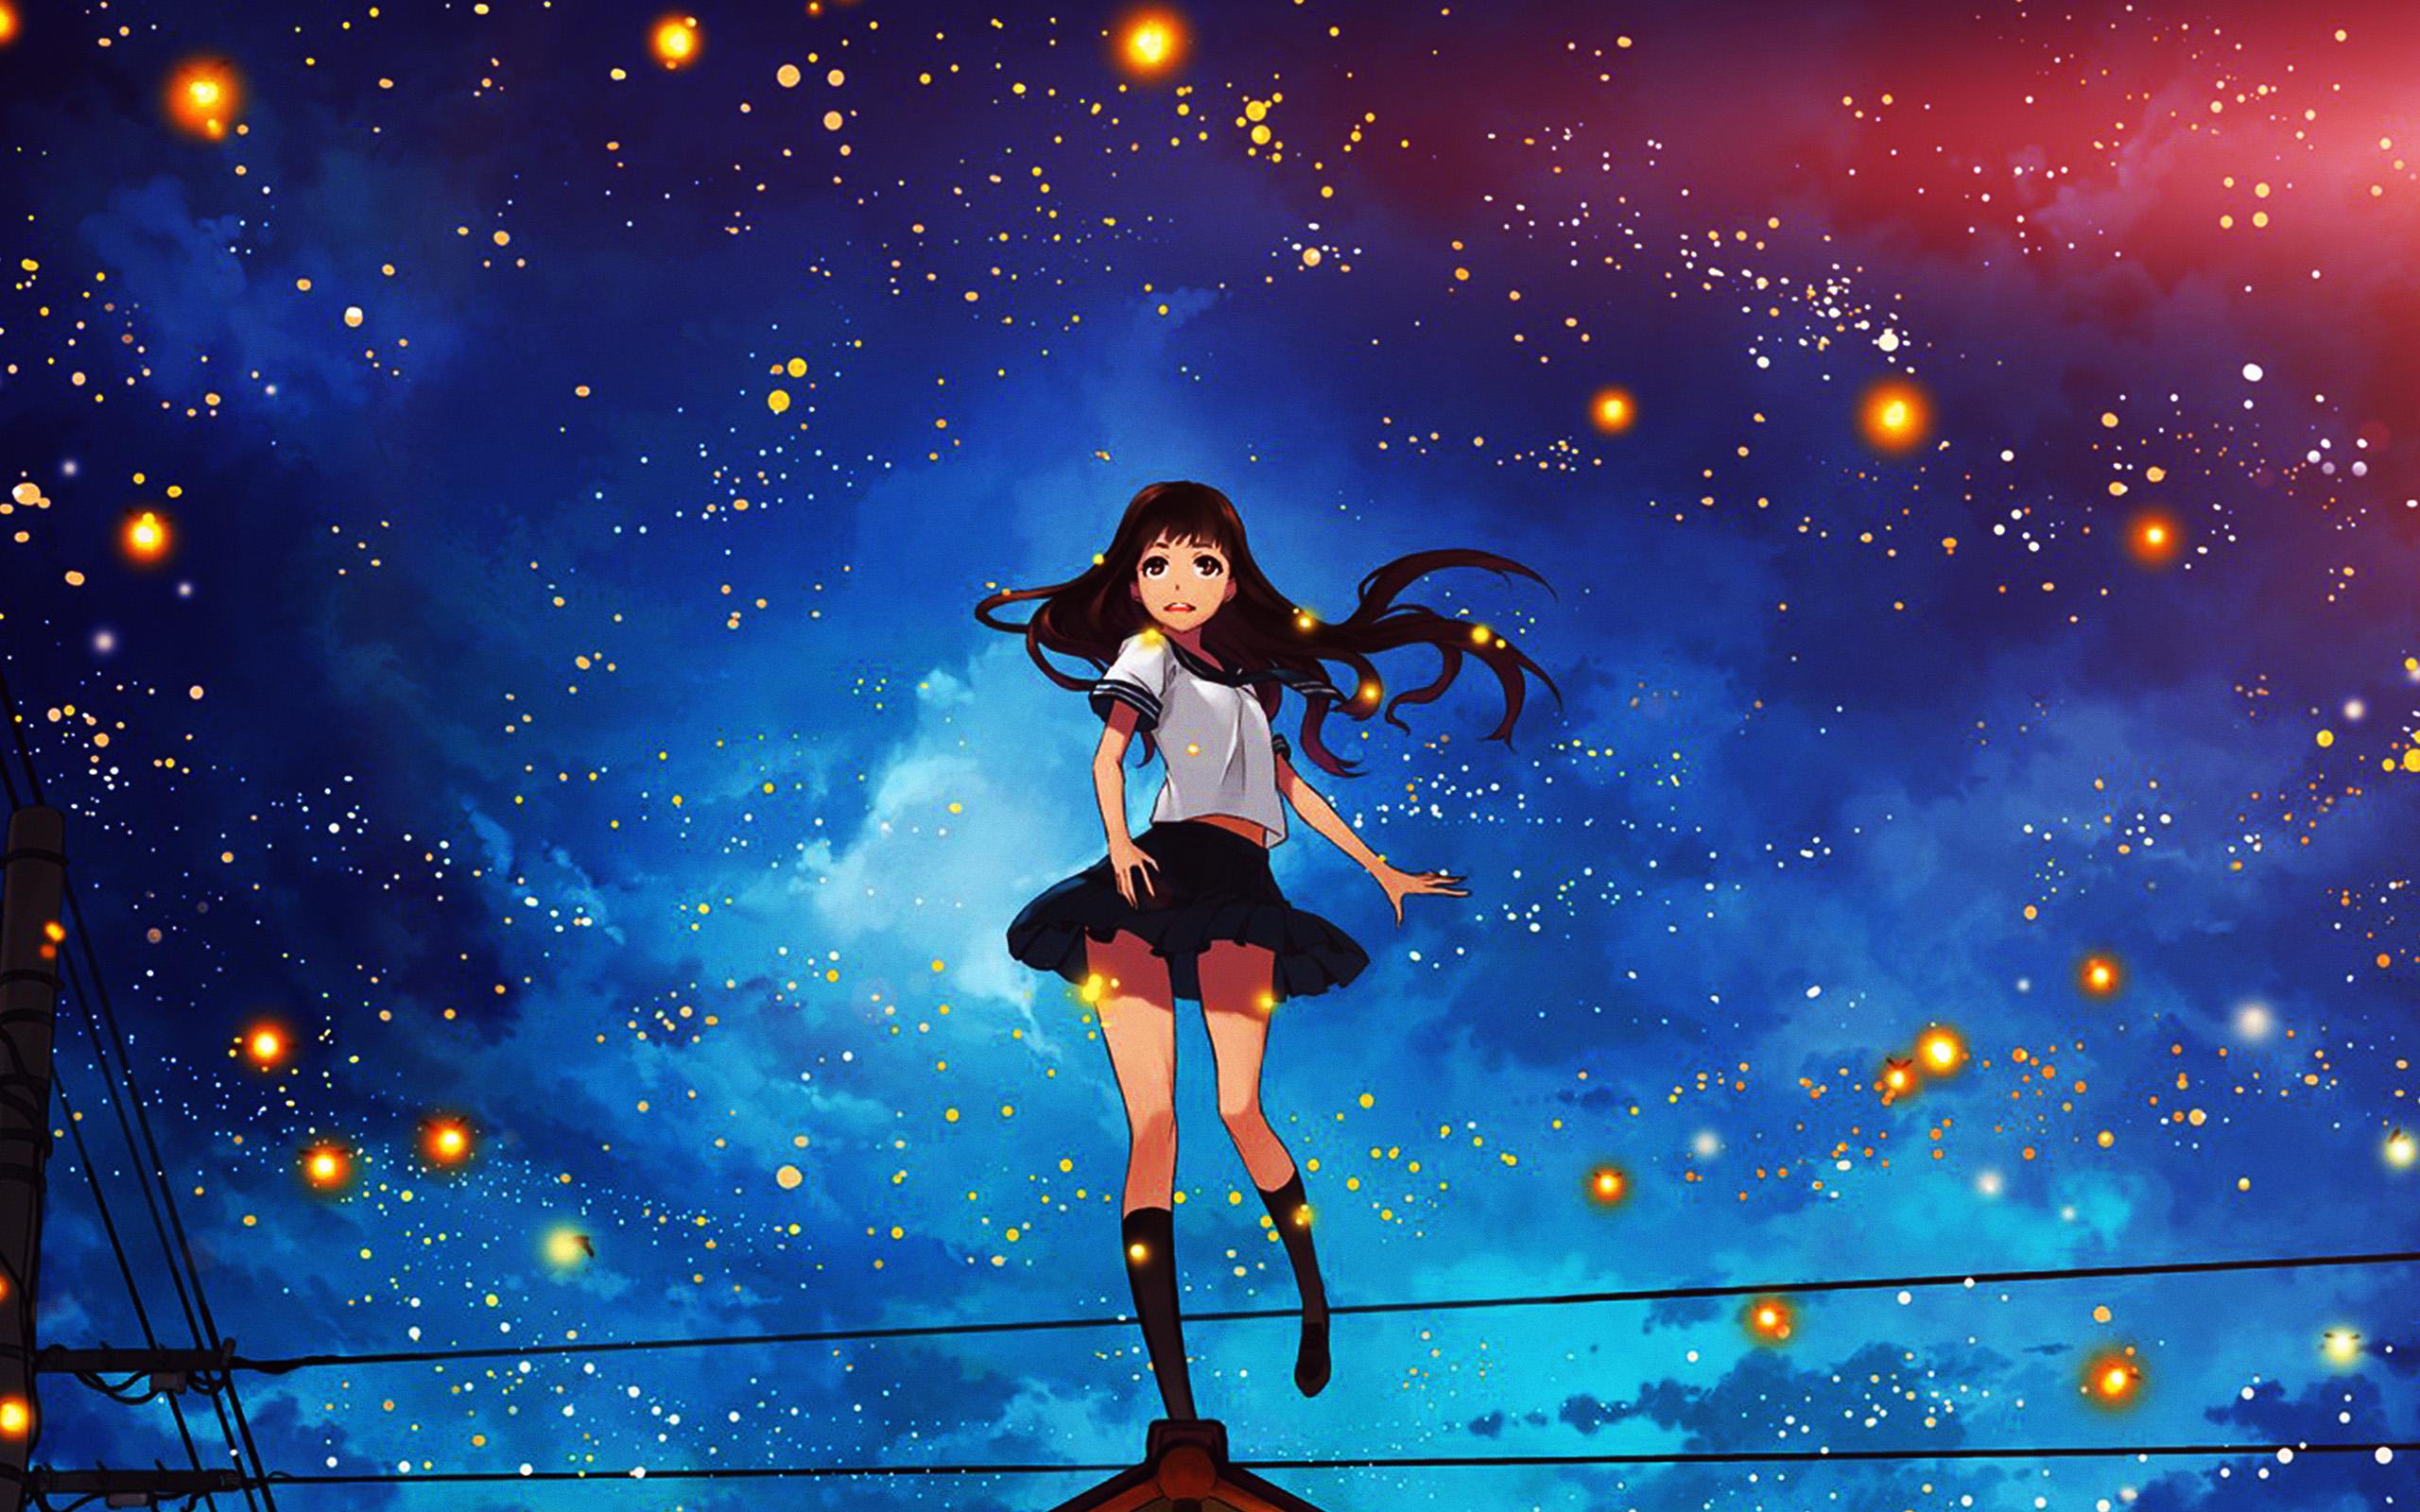 Cute Disney Wallpapers Hd Au47 Girl Anime Star Space Night Illustration Art Flare